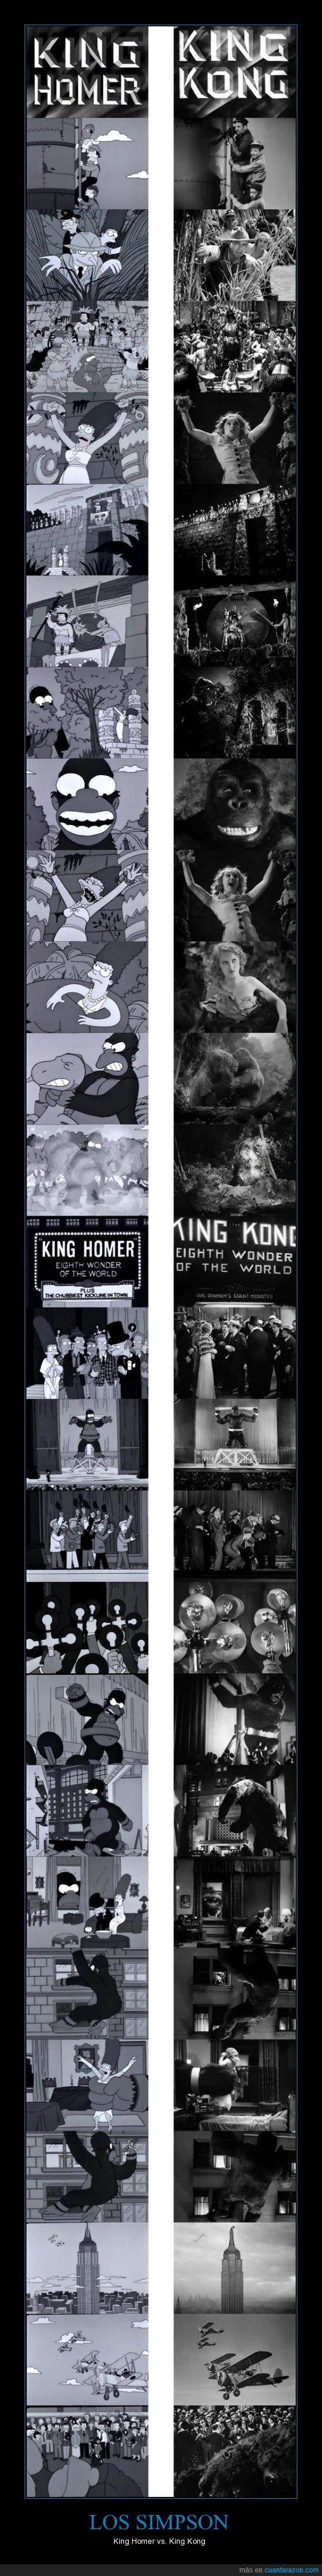 capitulo,homenaje,homer,king kong,pelicula